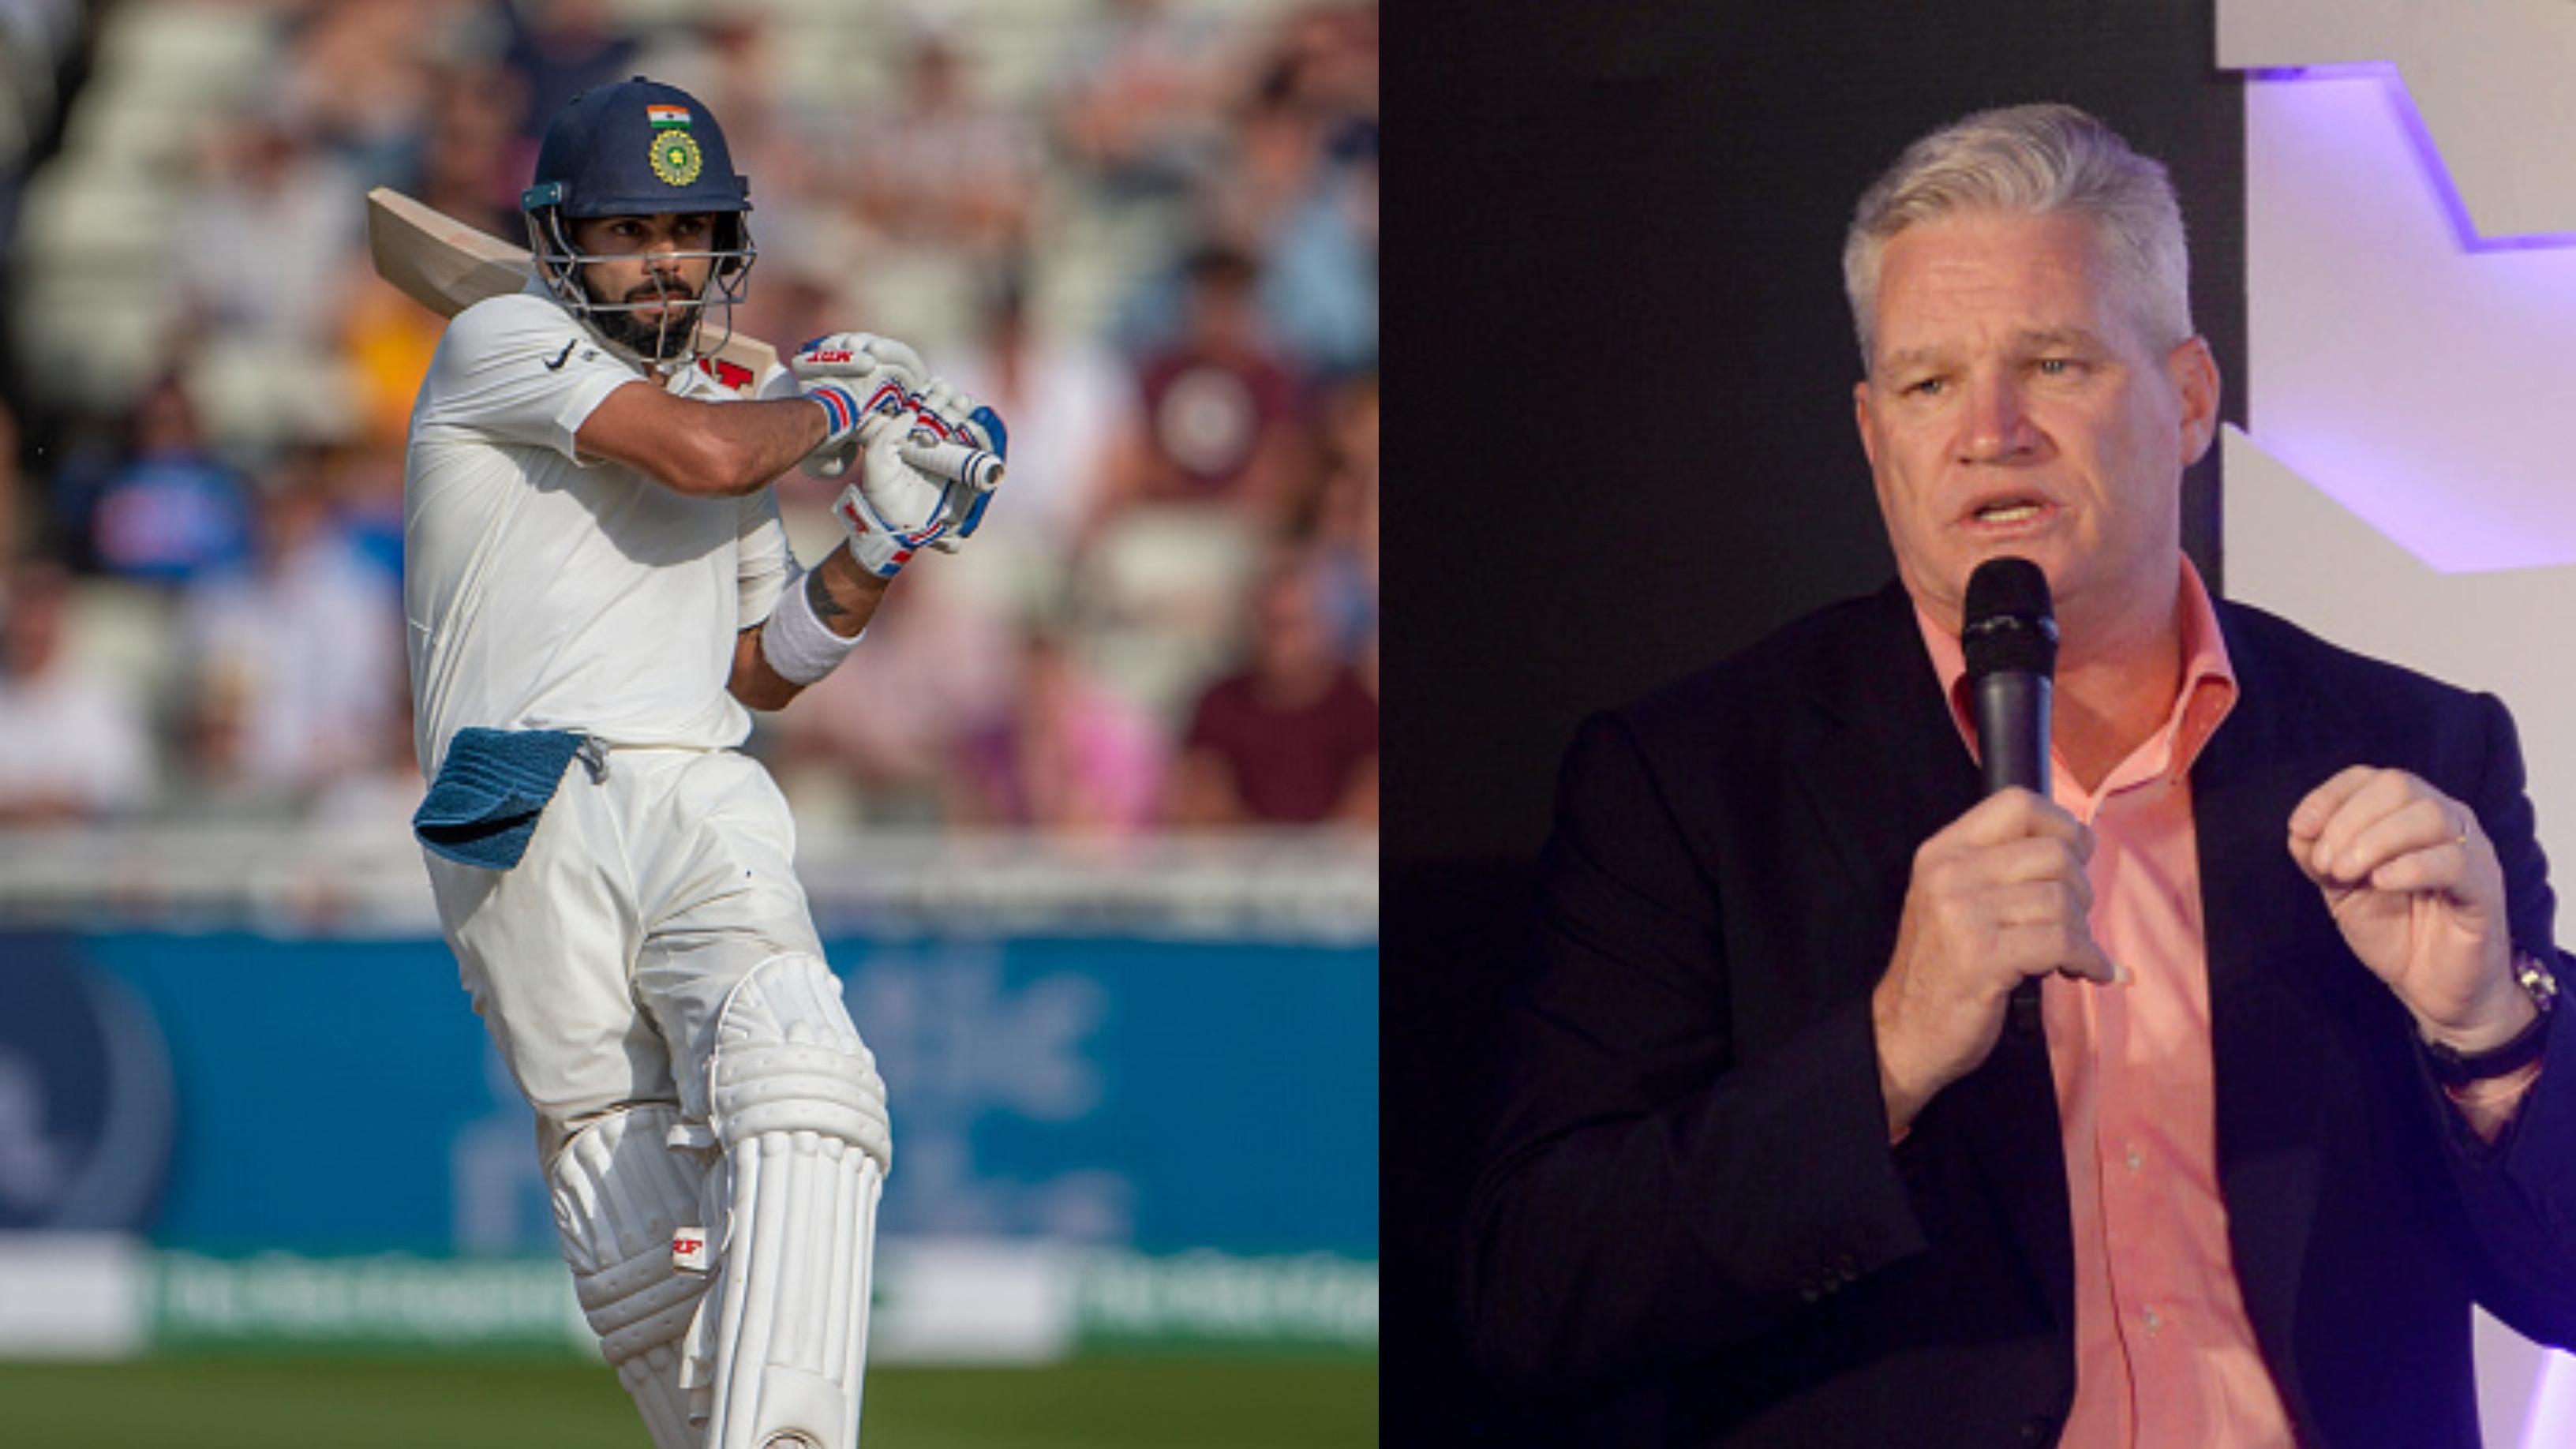 AUS v IND 2018-19: Dean Jones compares Virat Kohli's perfection in batting with Mona Lisa painting